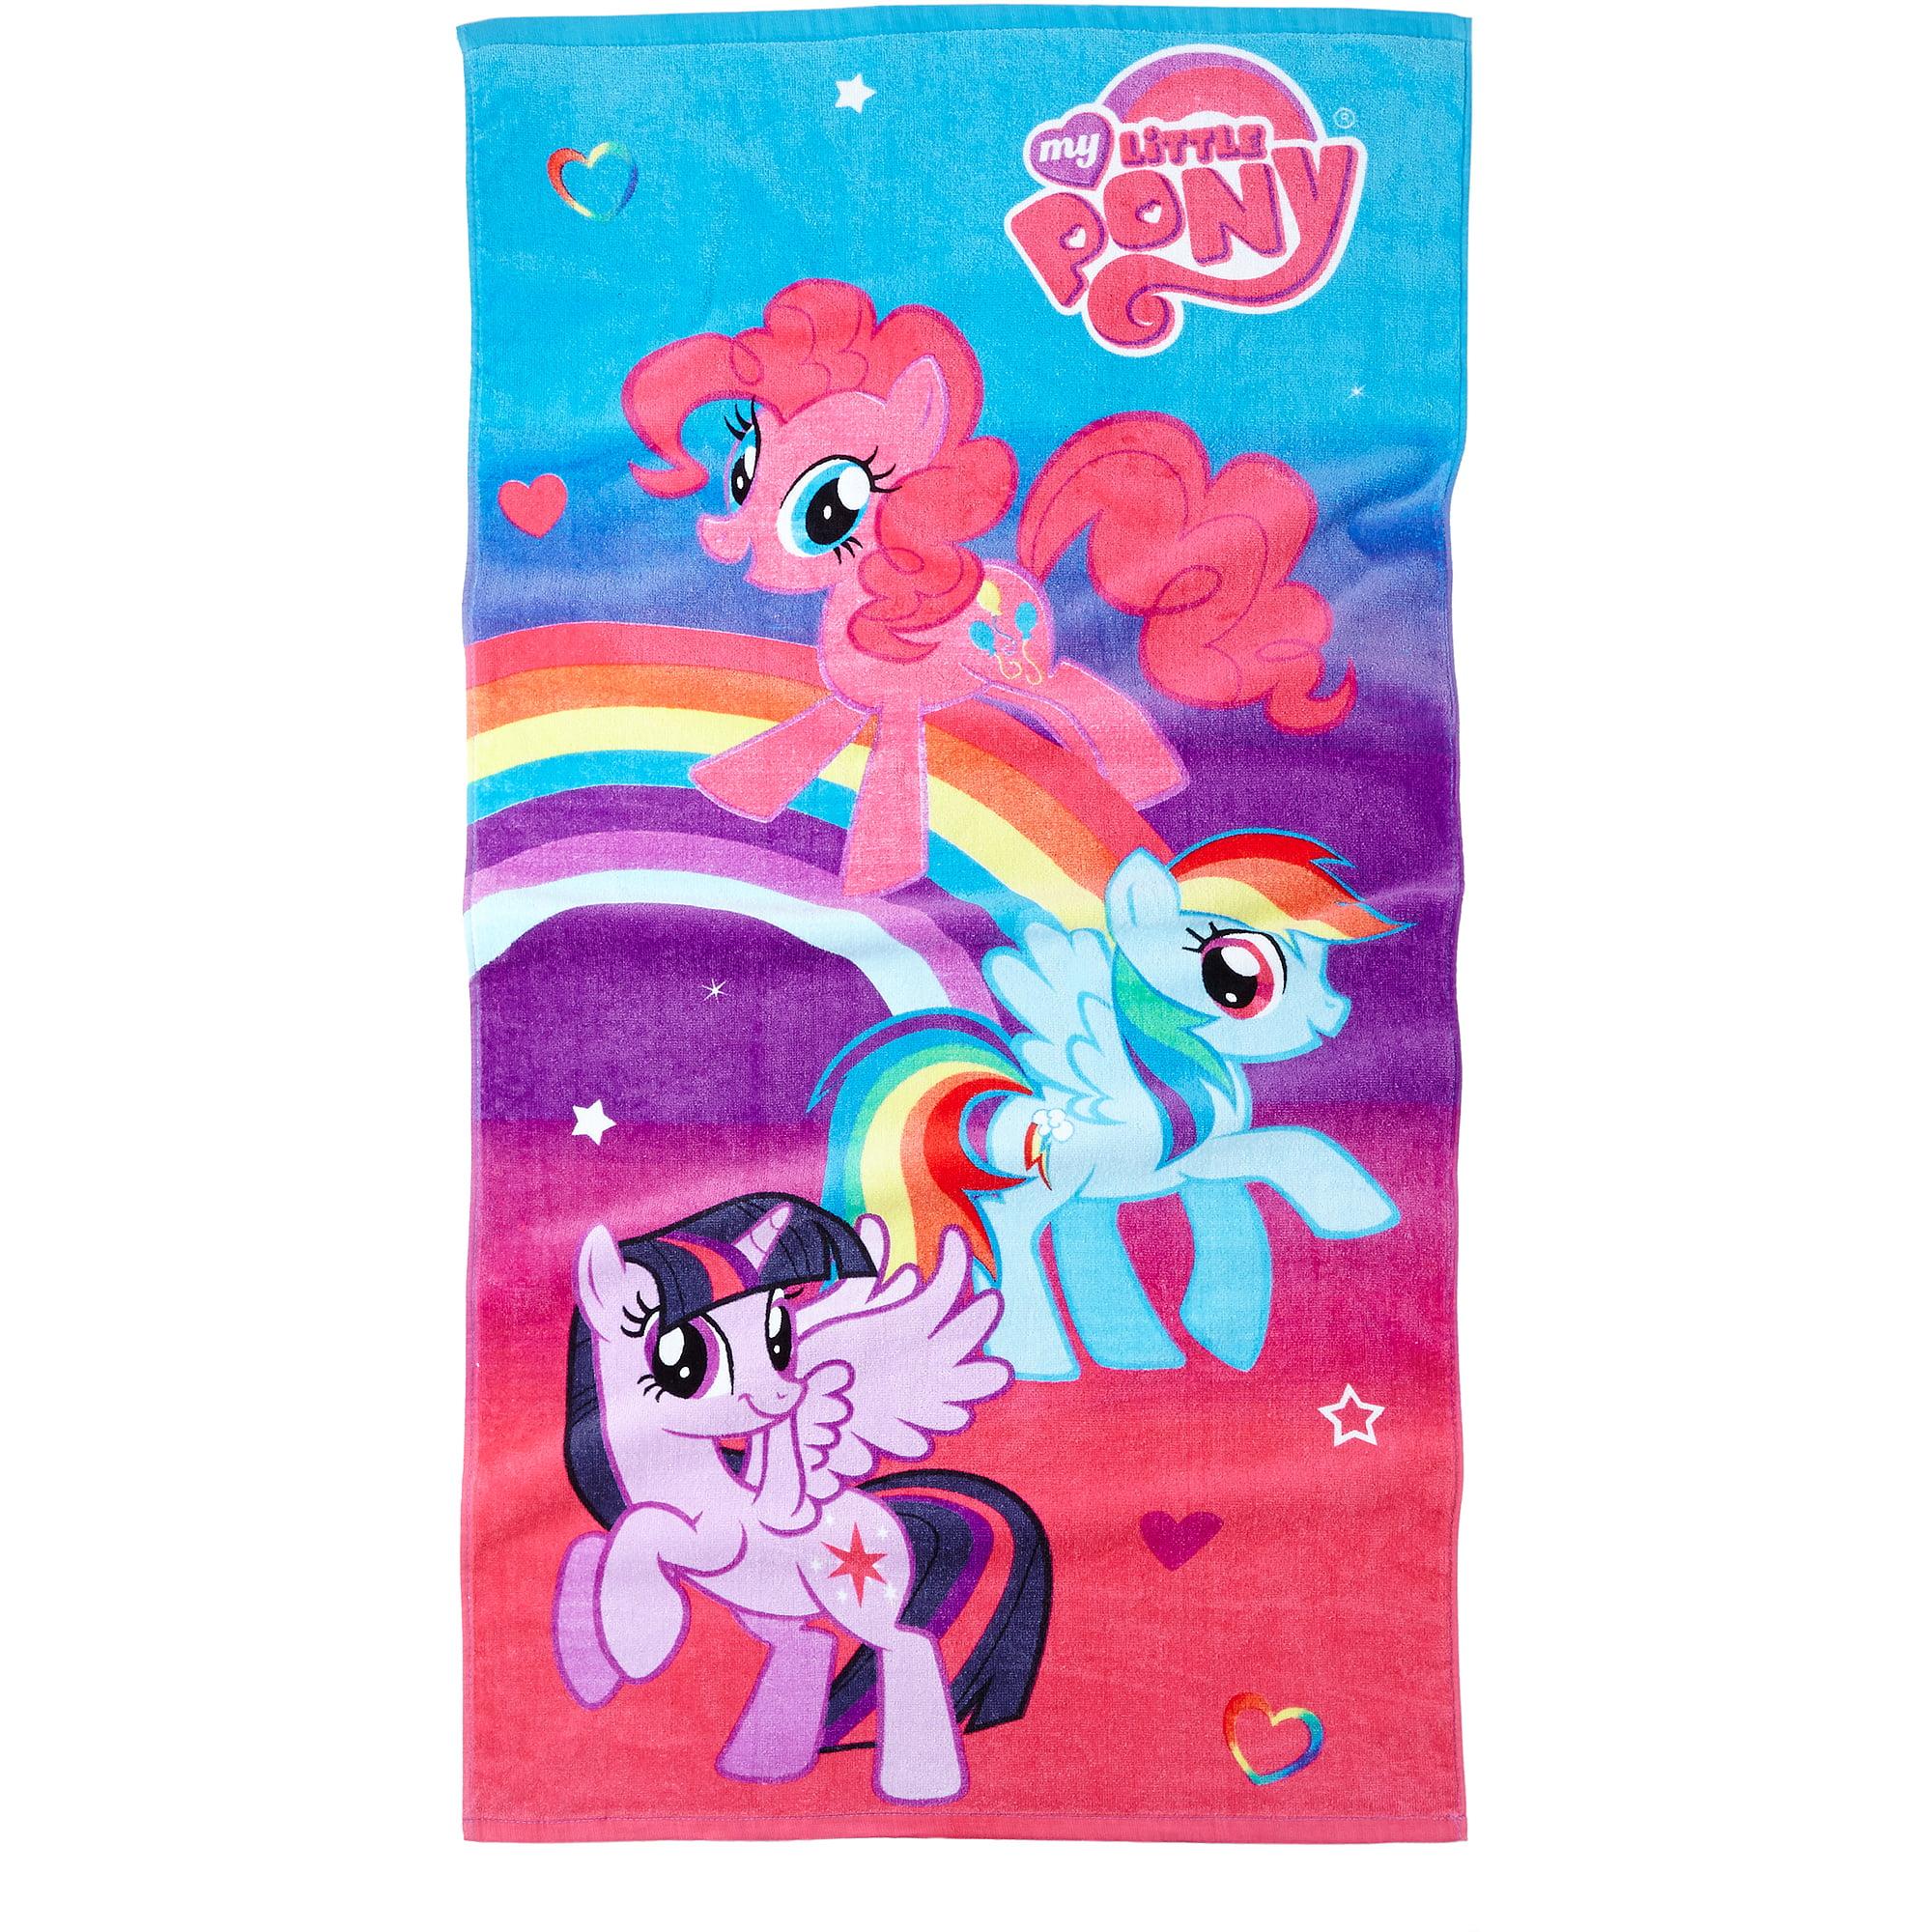 universal's my little pony bath towel - walmart